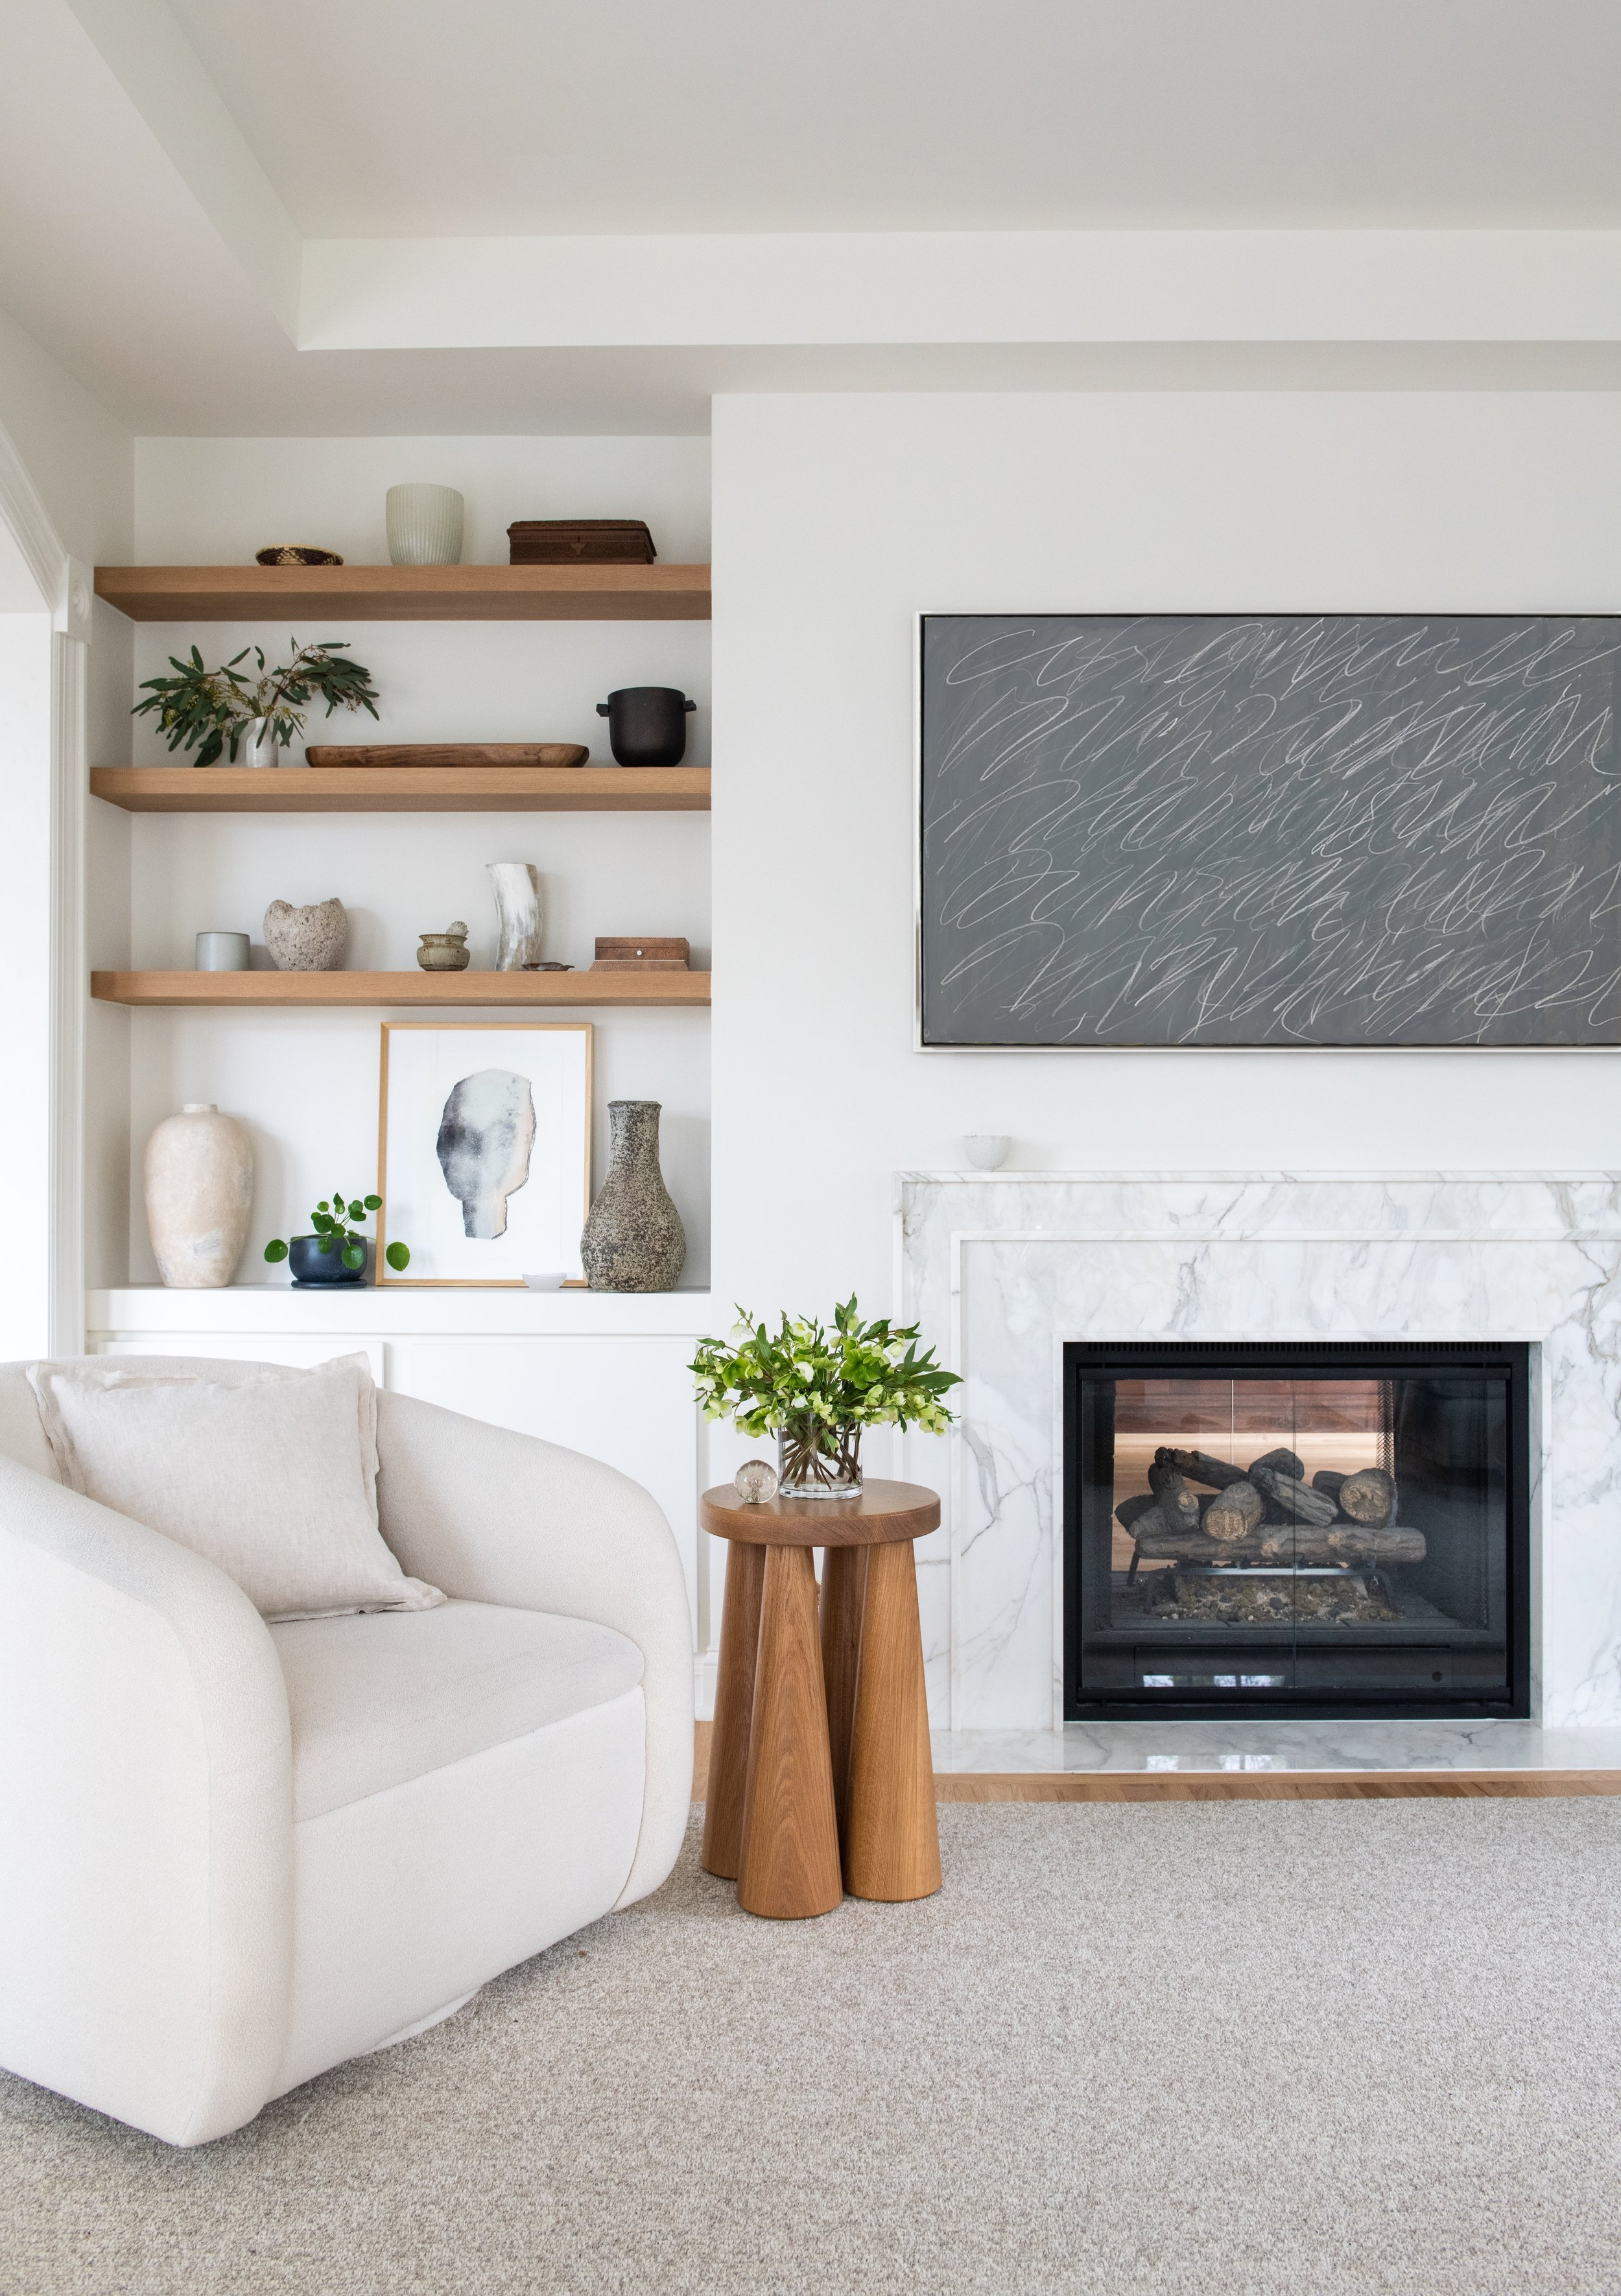 LAVA-INTERIORS-MANOR-ROAD-RIDGEWOOD-NEW-JERSEY-LIVING-ROOM-FIREPLACE-HOUSE-HOME-RENOVATION.jpg